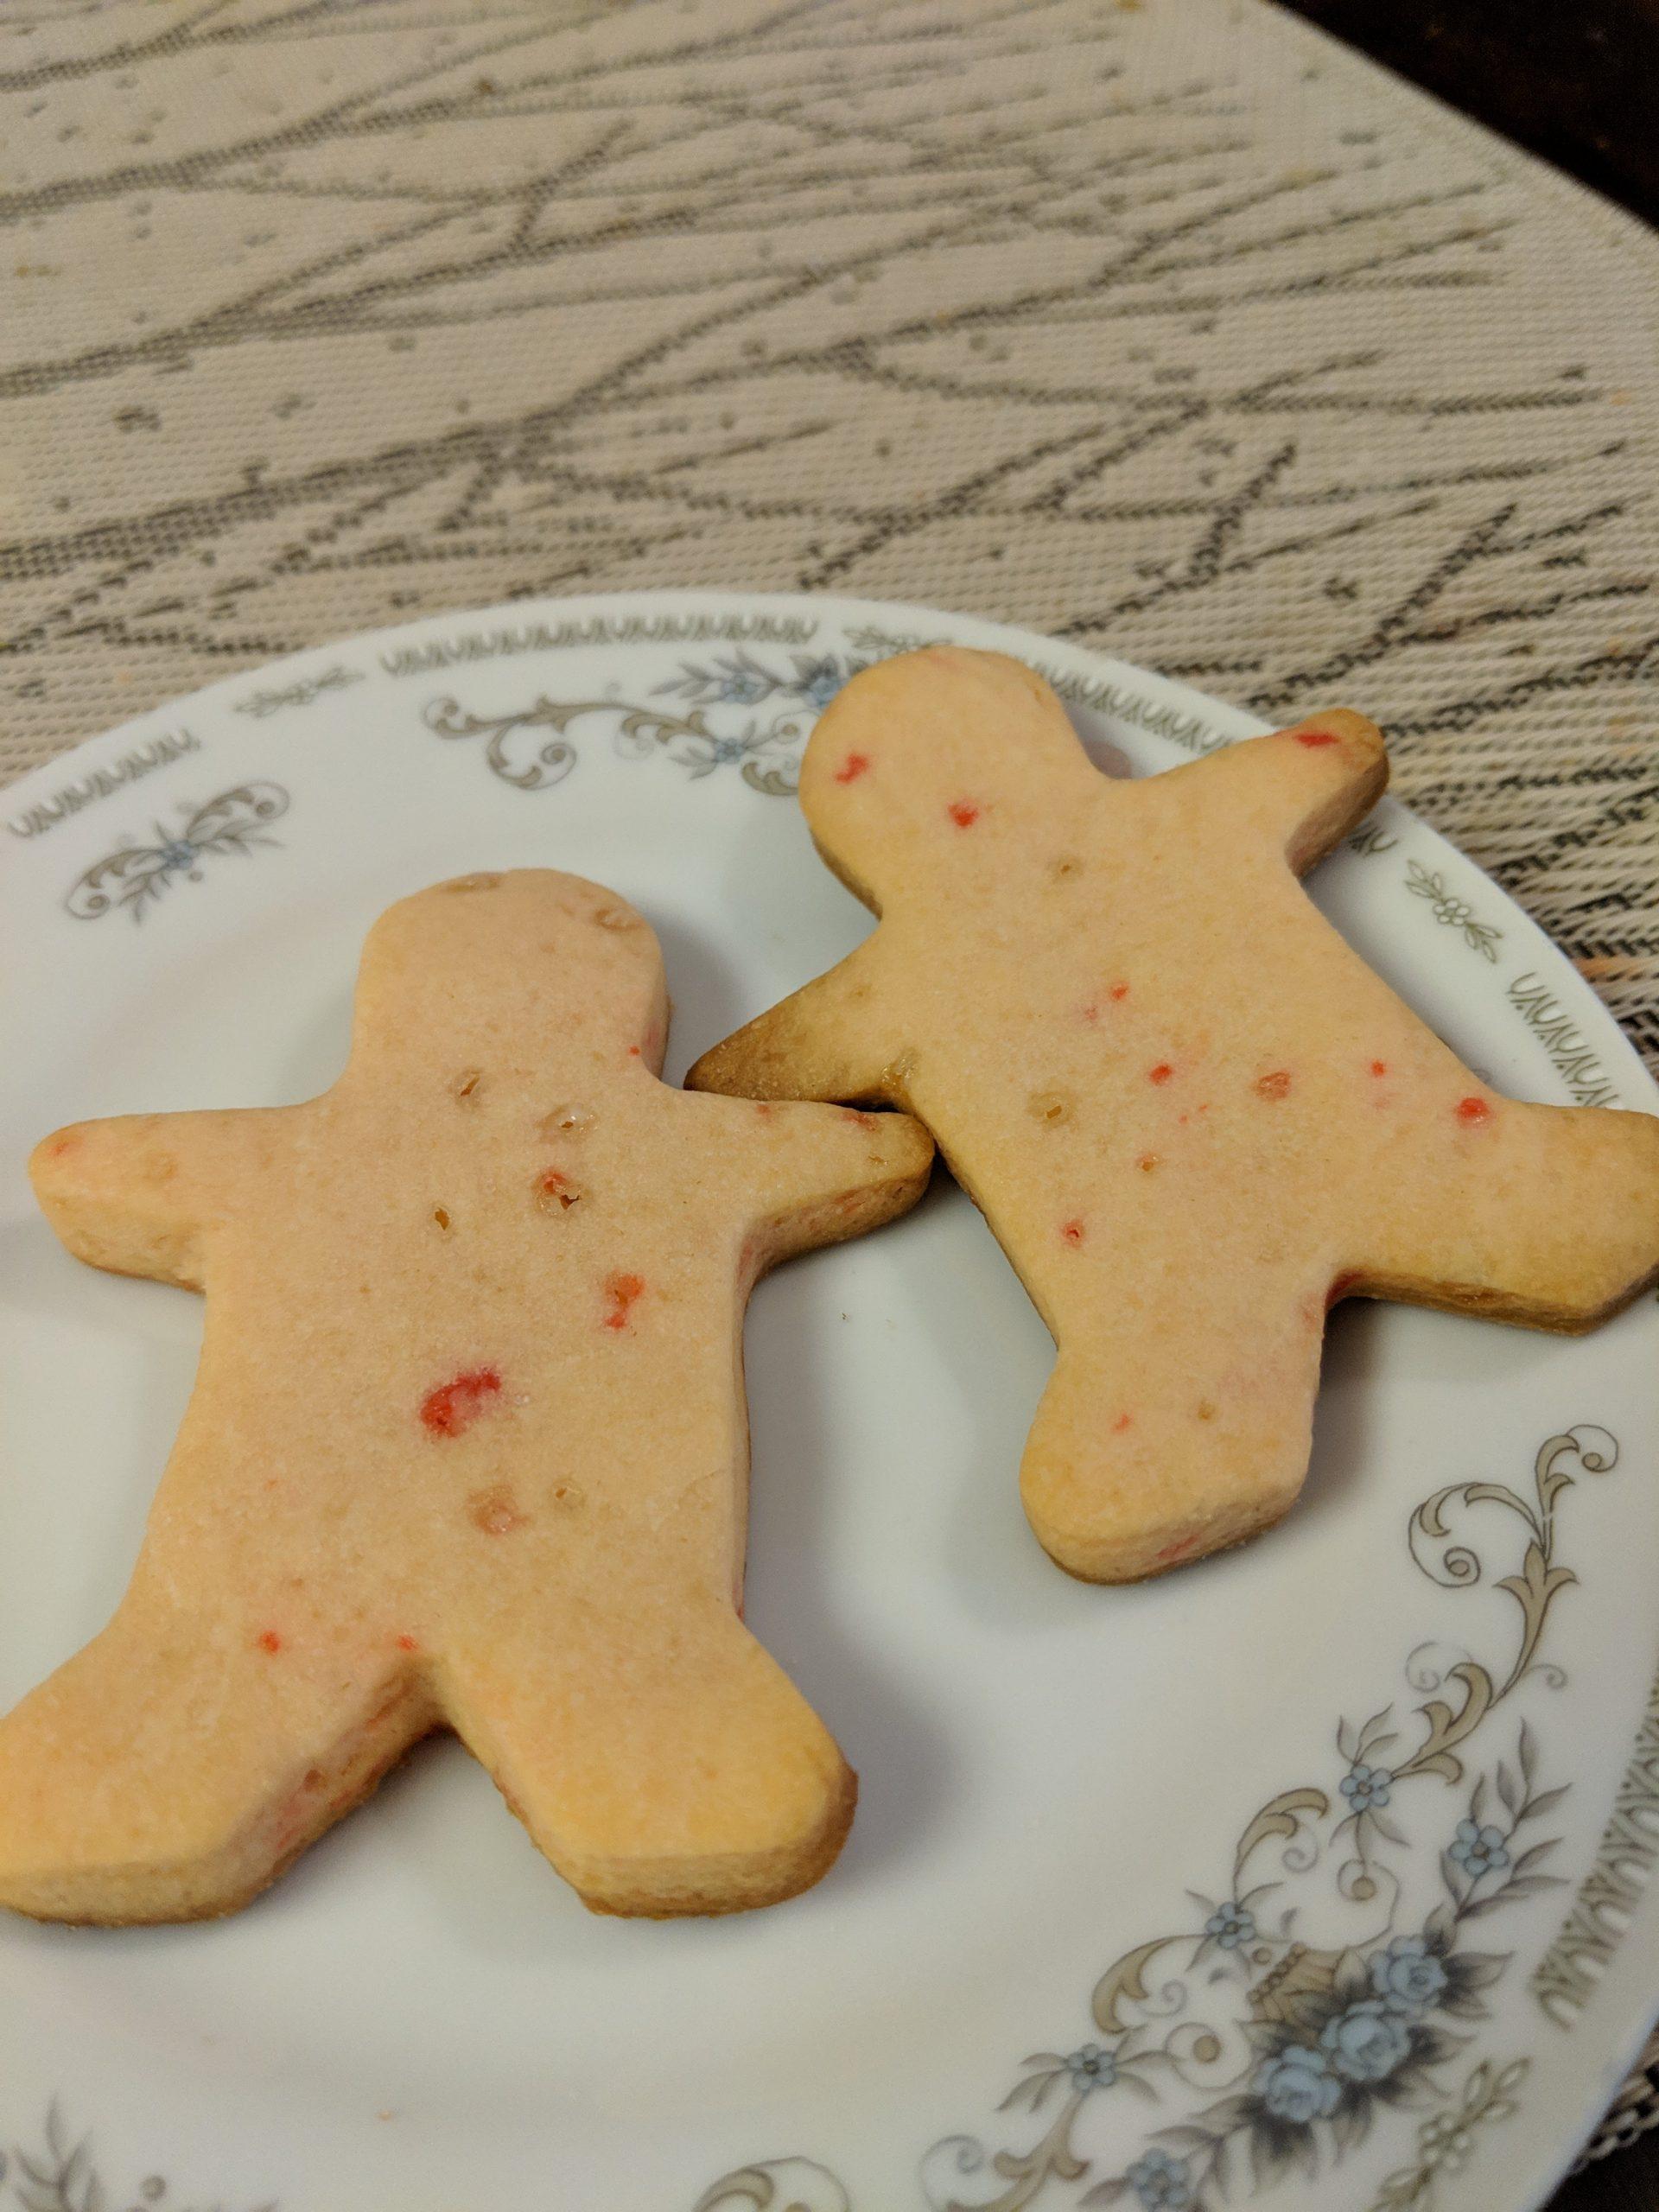 Festive Christmas Cookies to Bake